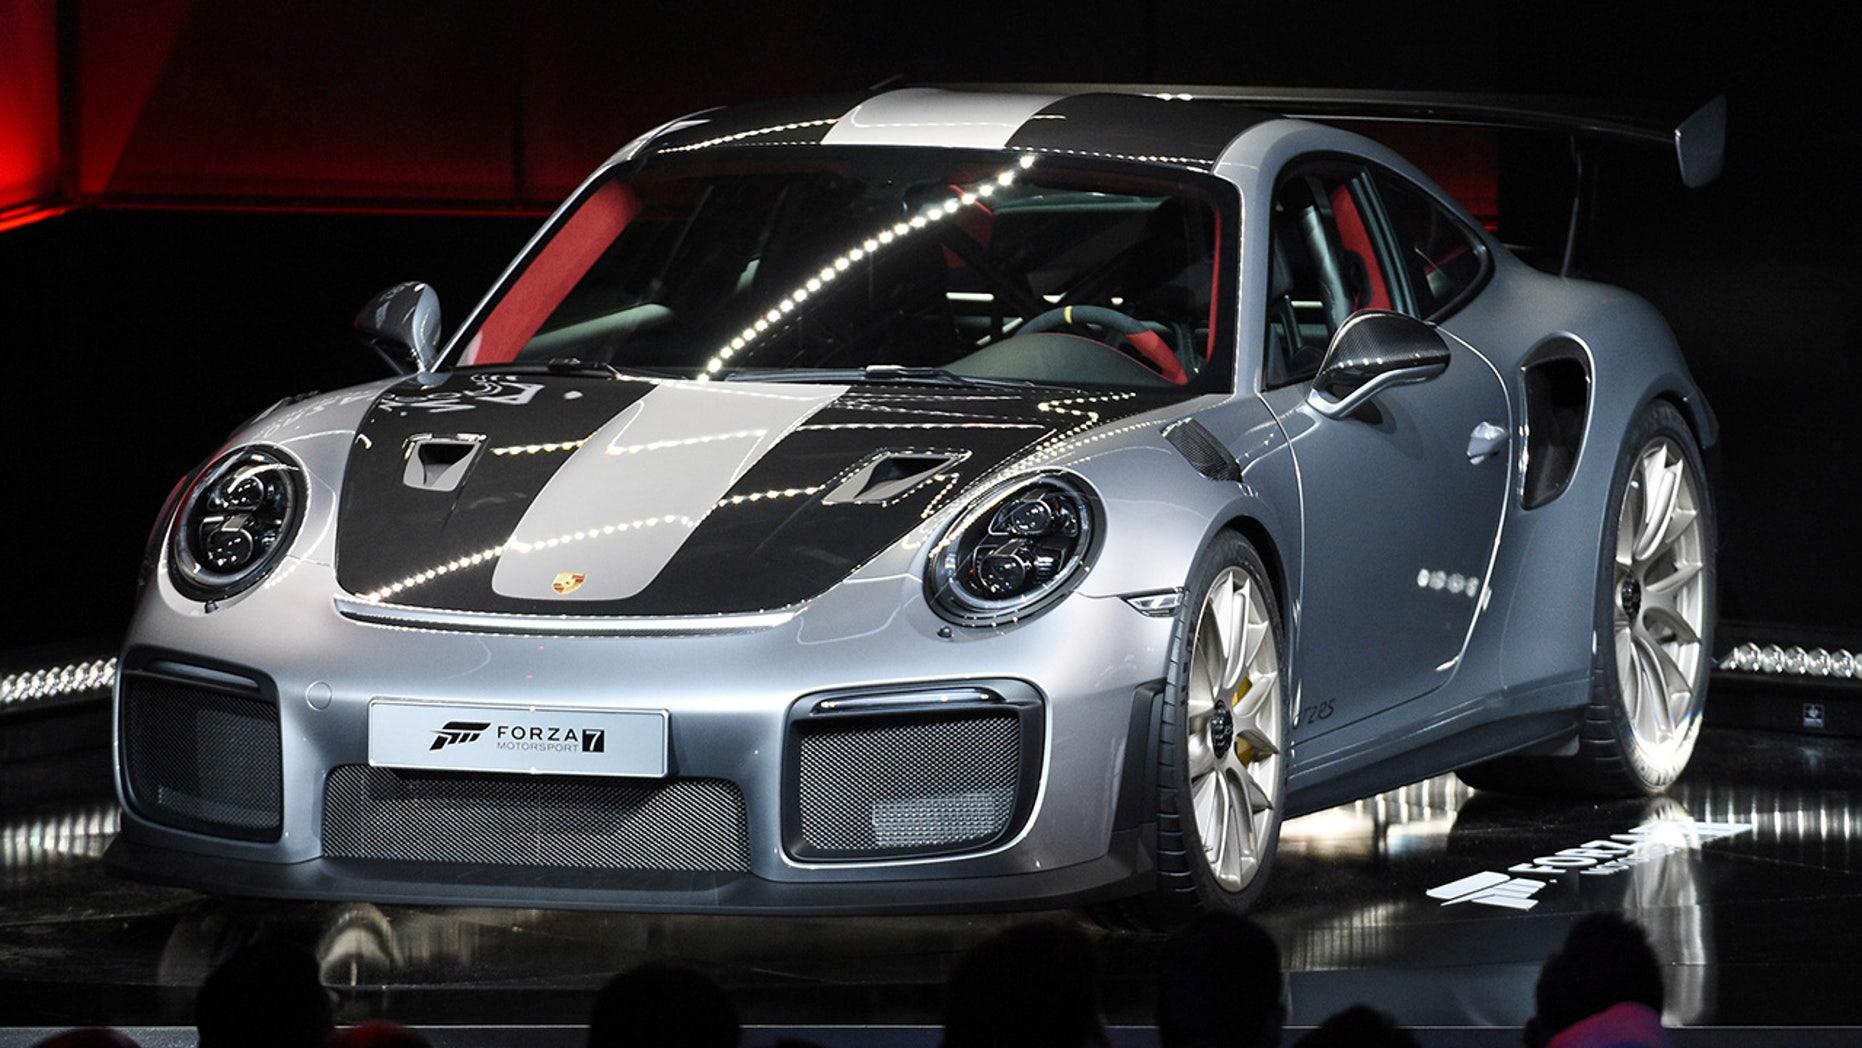 2018 Porsche 911 GT2 RS tops out at 211 mph.